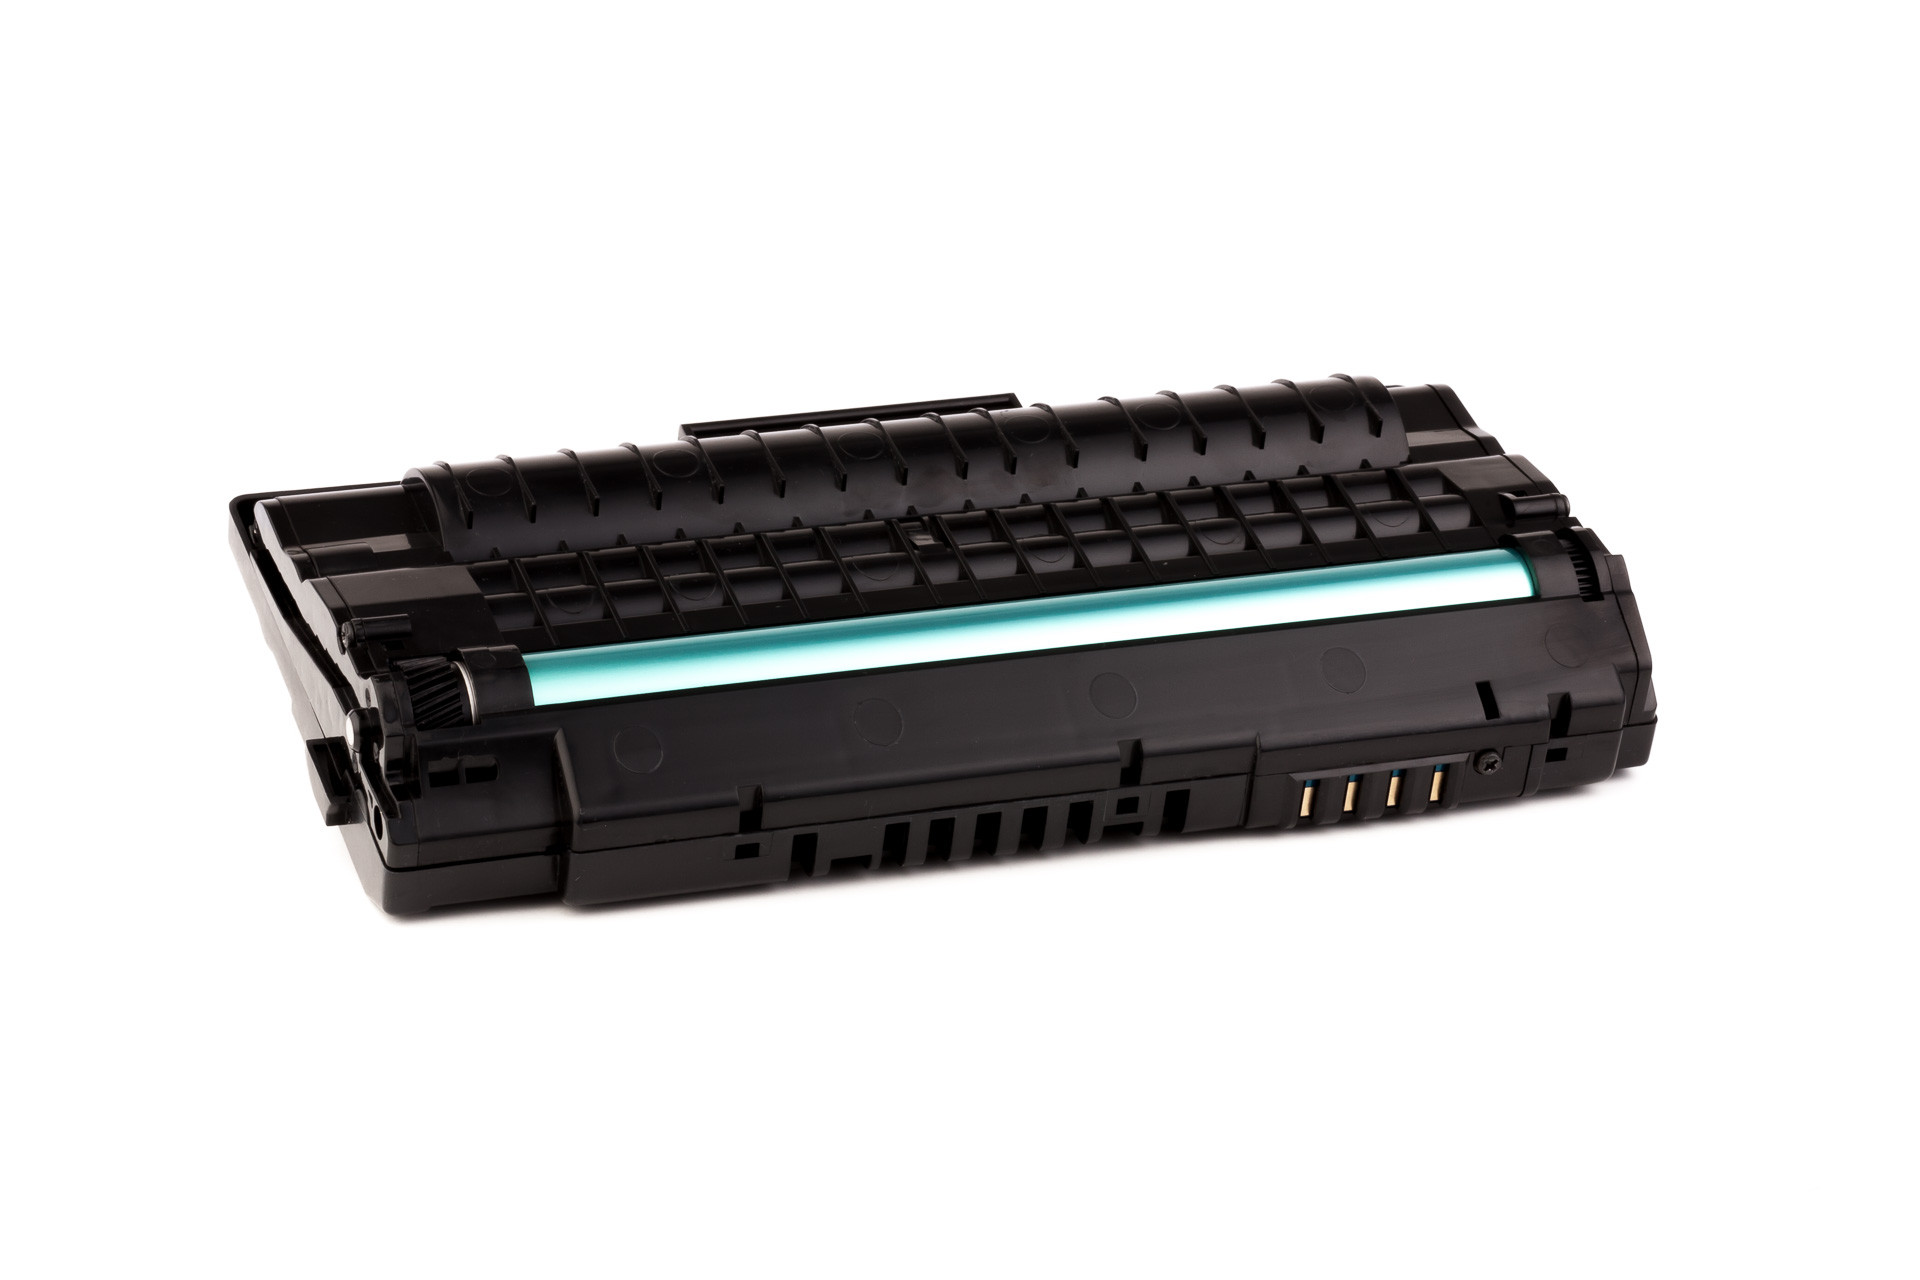 Alternativ-Toner fuer Samsung ML-2250 D5/ELS schwarz